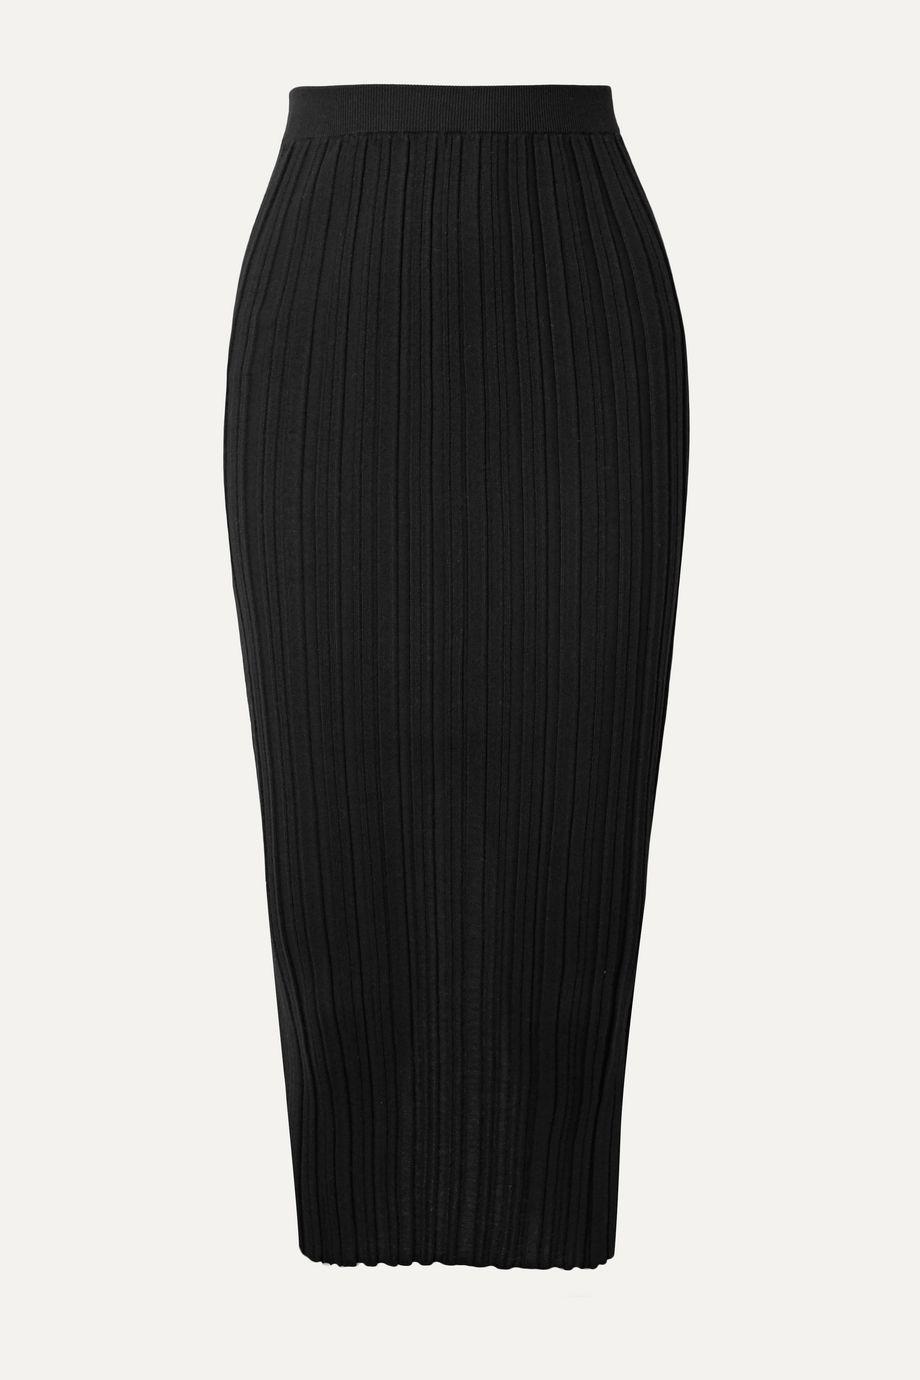 Helmut Lang 罗纹美利奴羊毛混纺中长半身裙